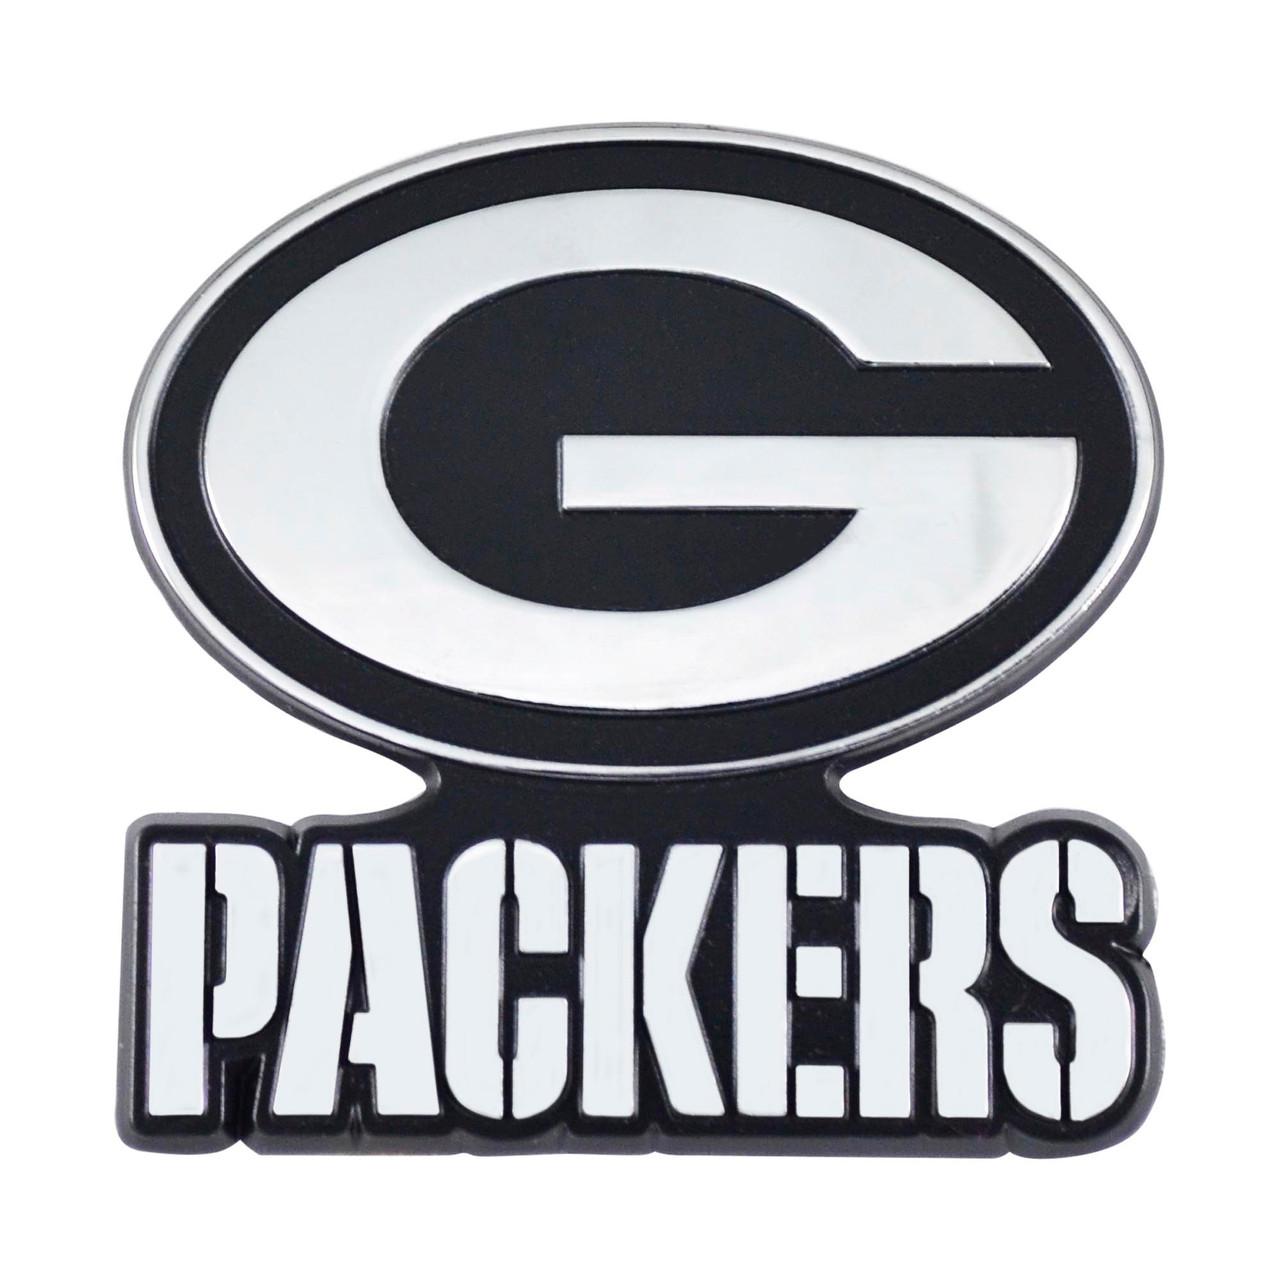 Green Bay Packers Auto Emblem Premium Metal Chrome